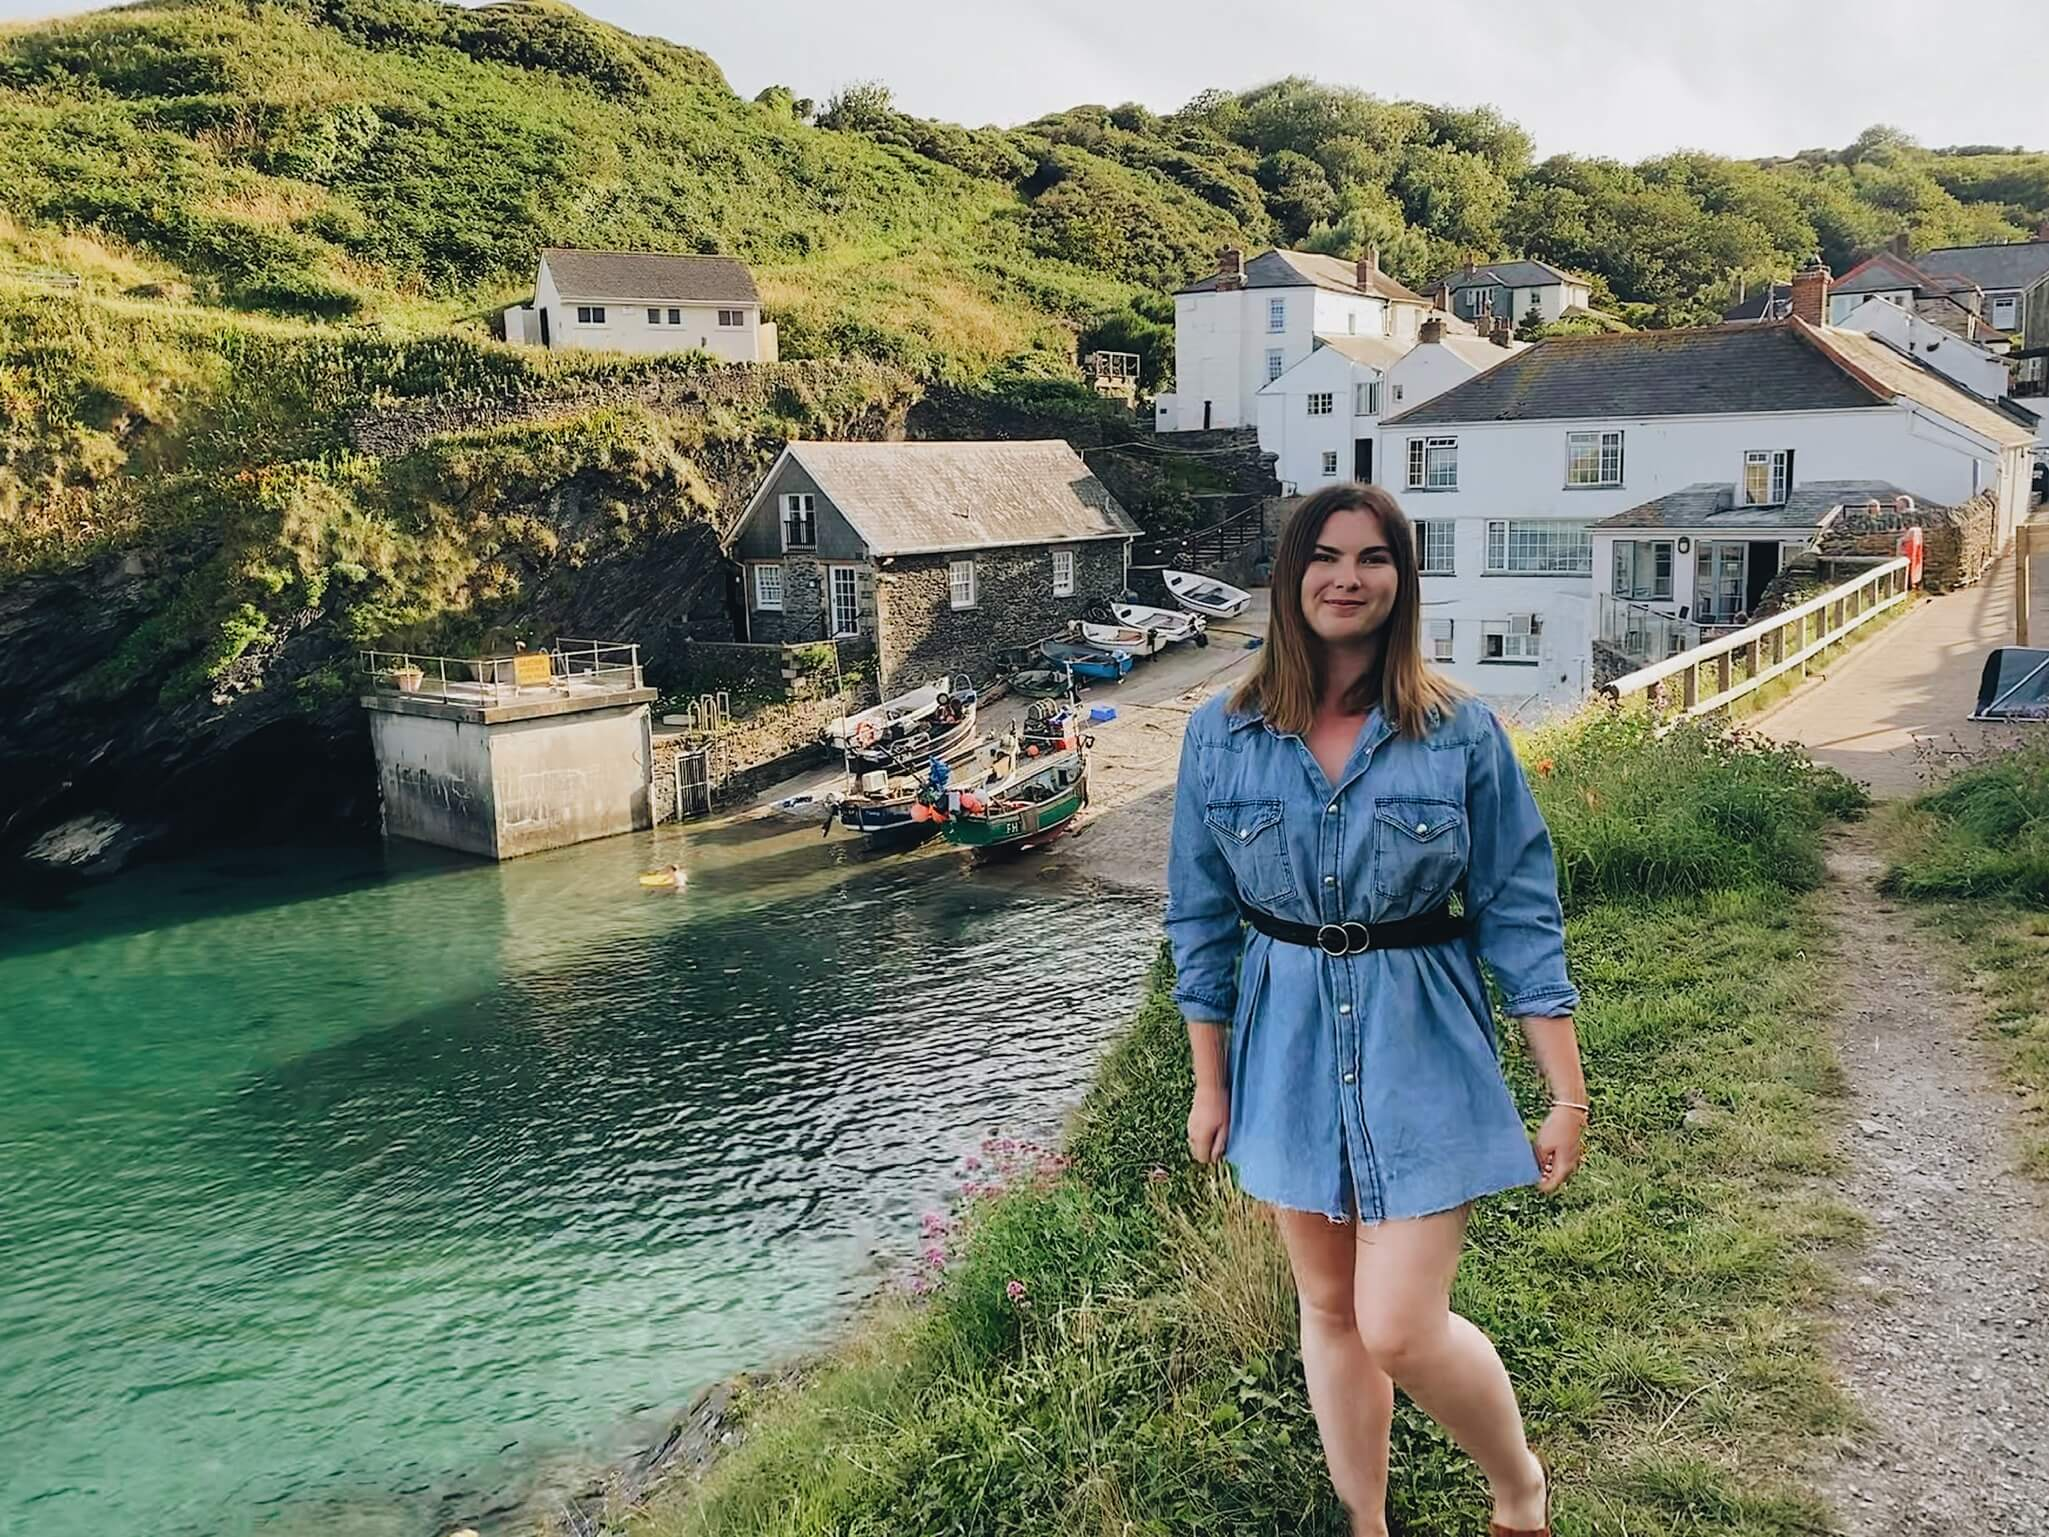 Portloe Cornwall weekend away